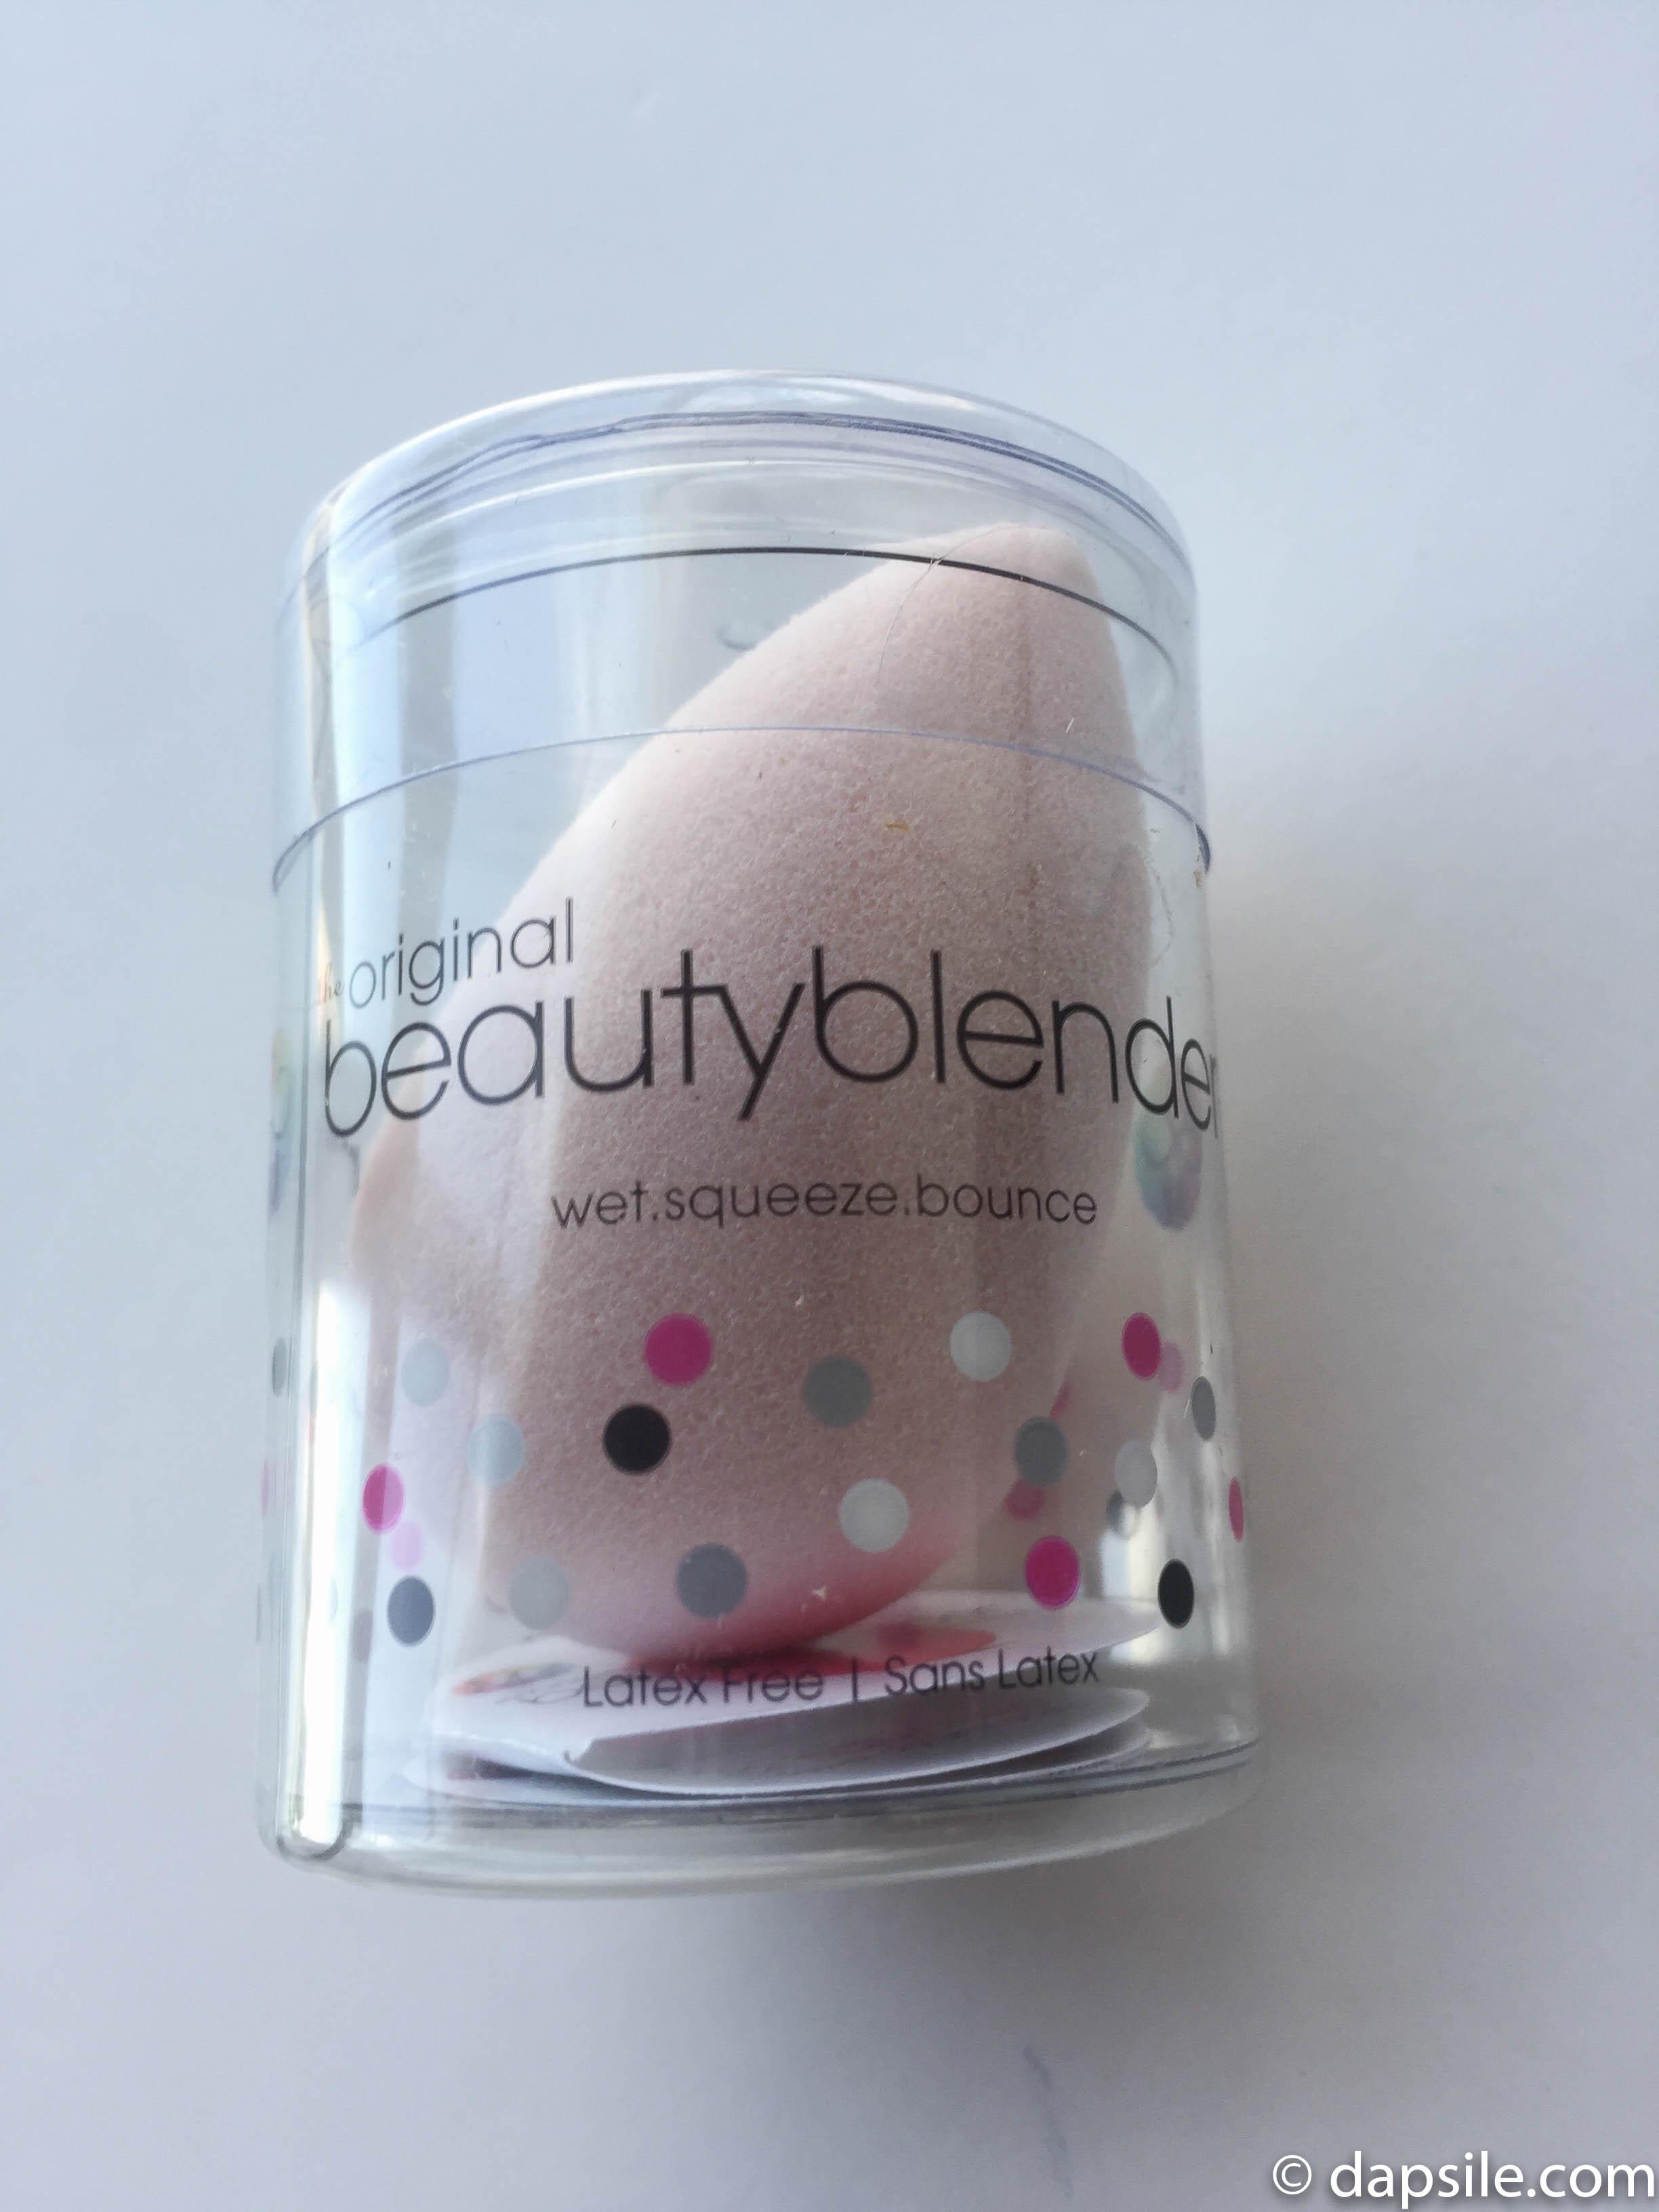 Beauty Blender from the FabFitFun Fall 2018 Subscription Box